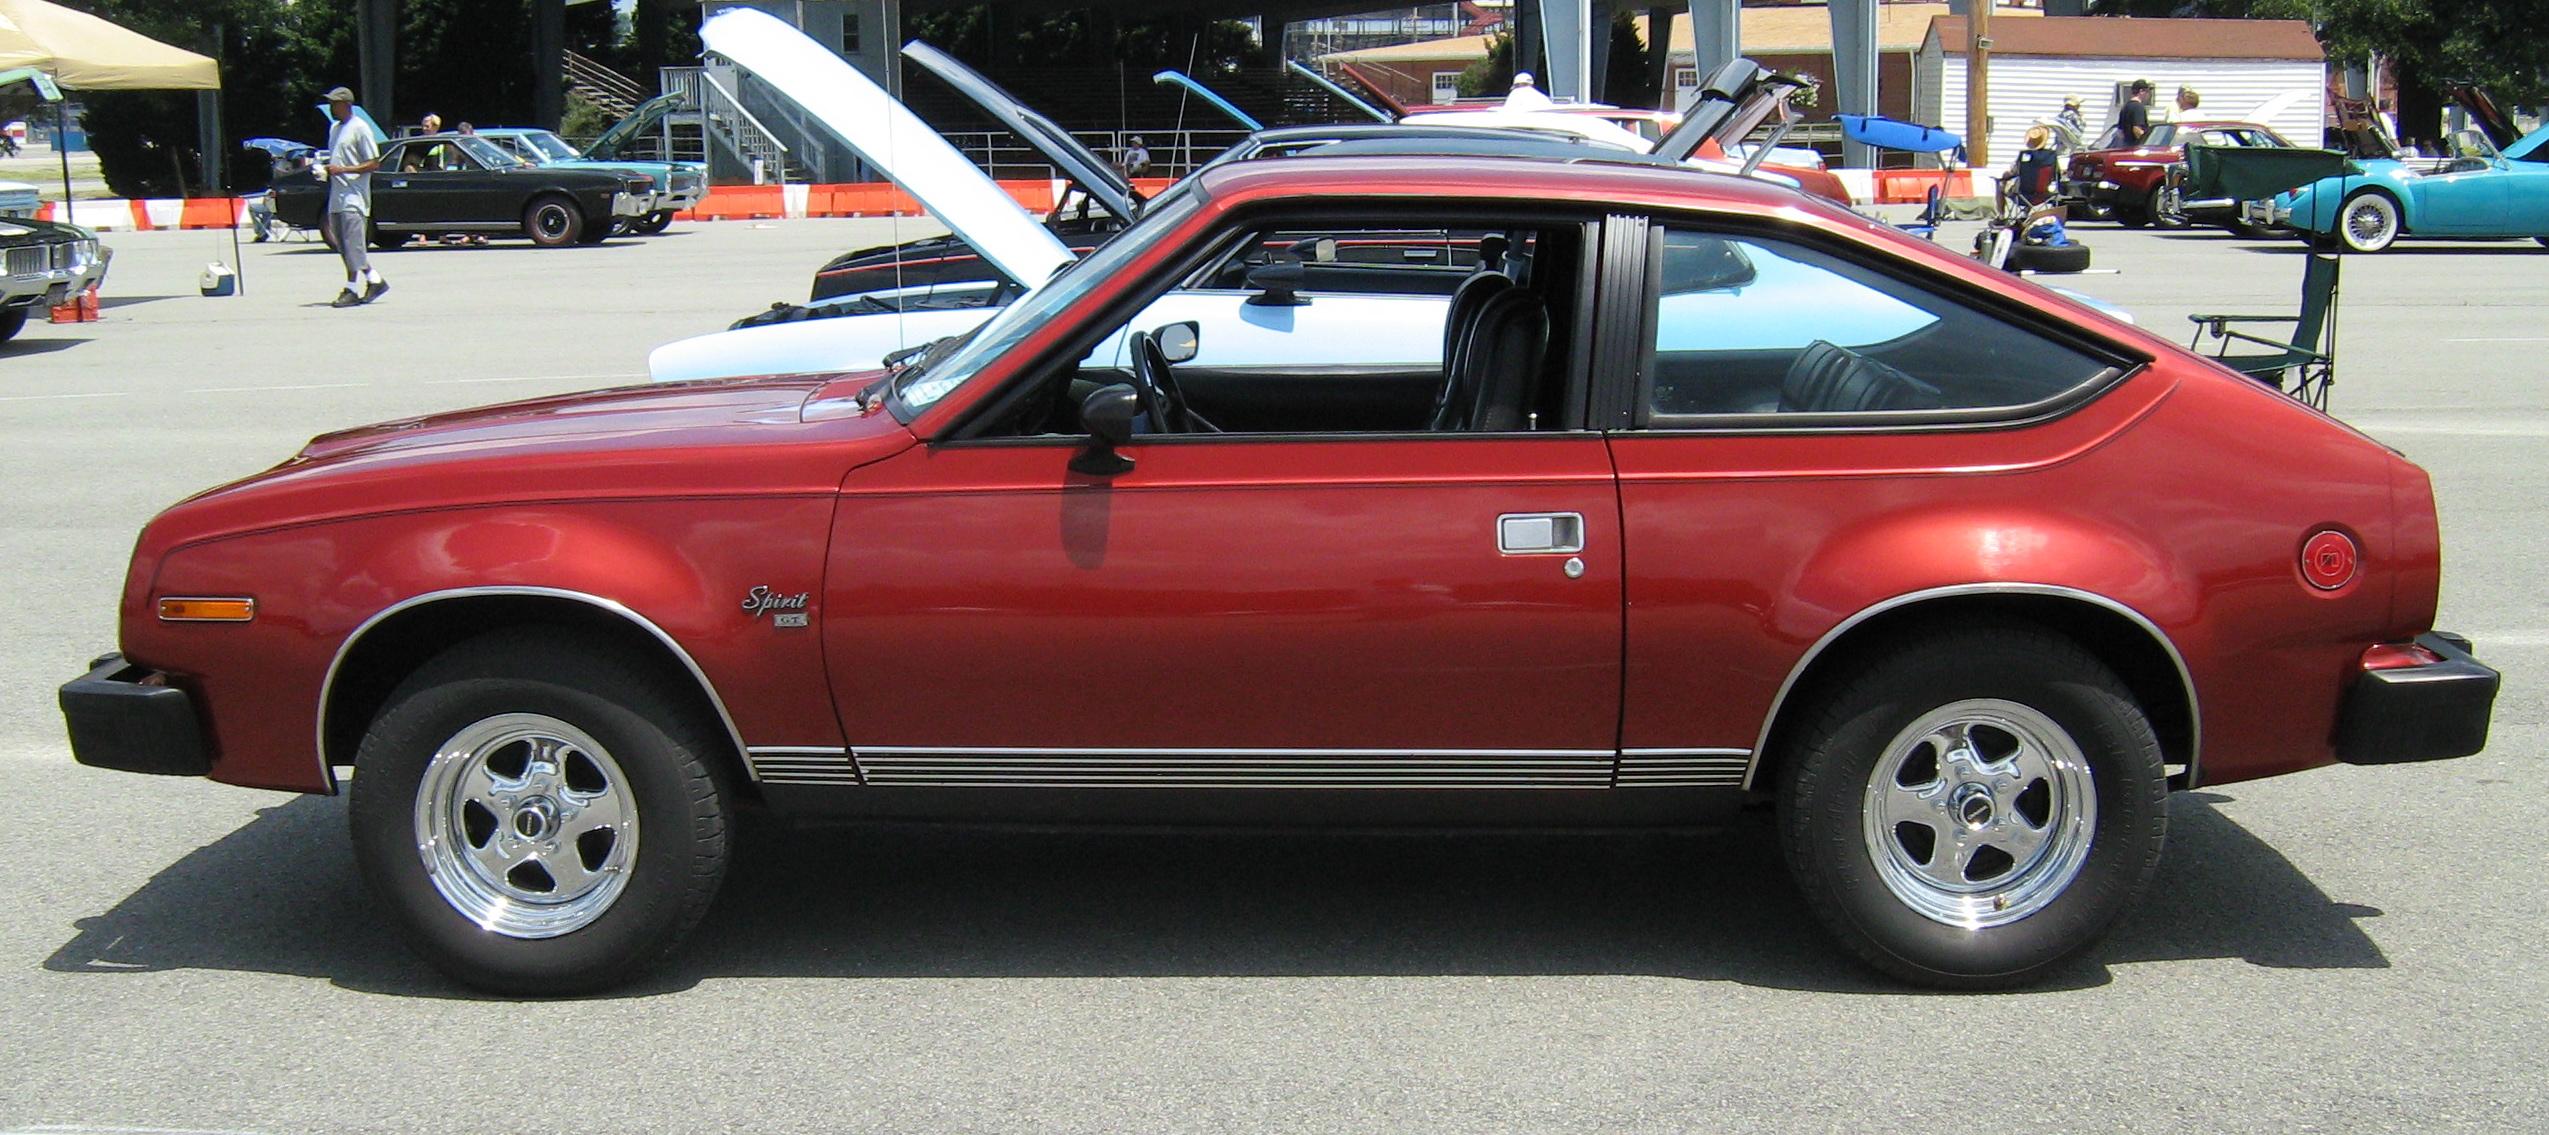 1979_AMC_Spirit_GT_V8_Russet_SL.jpg